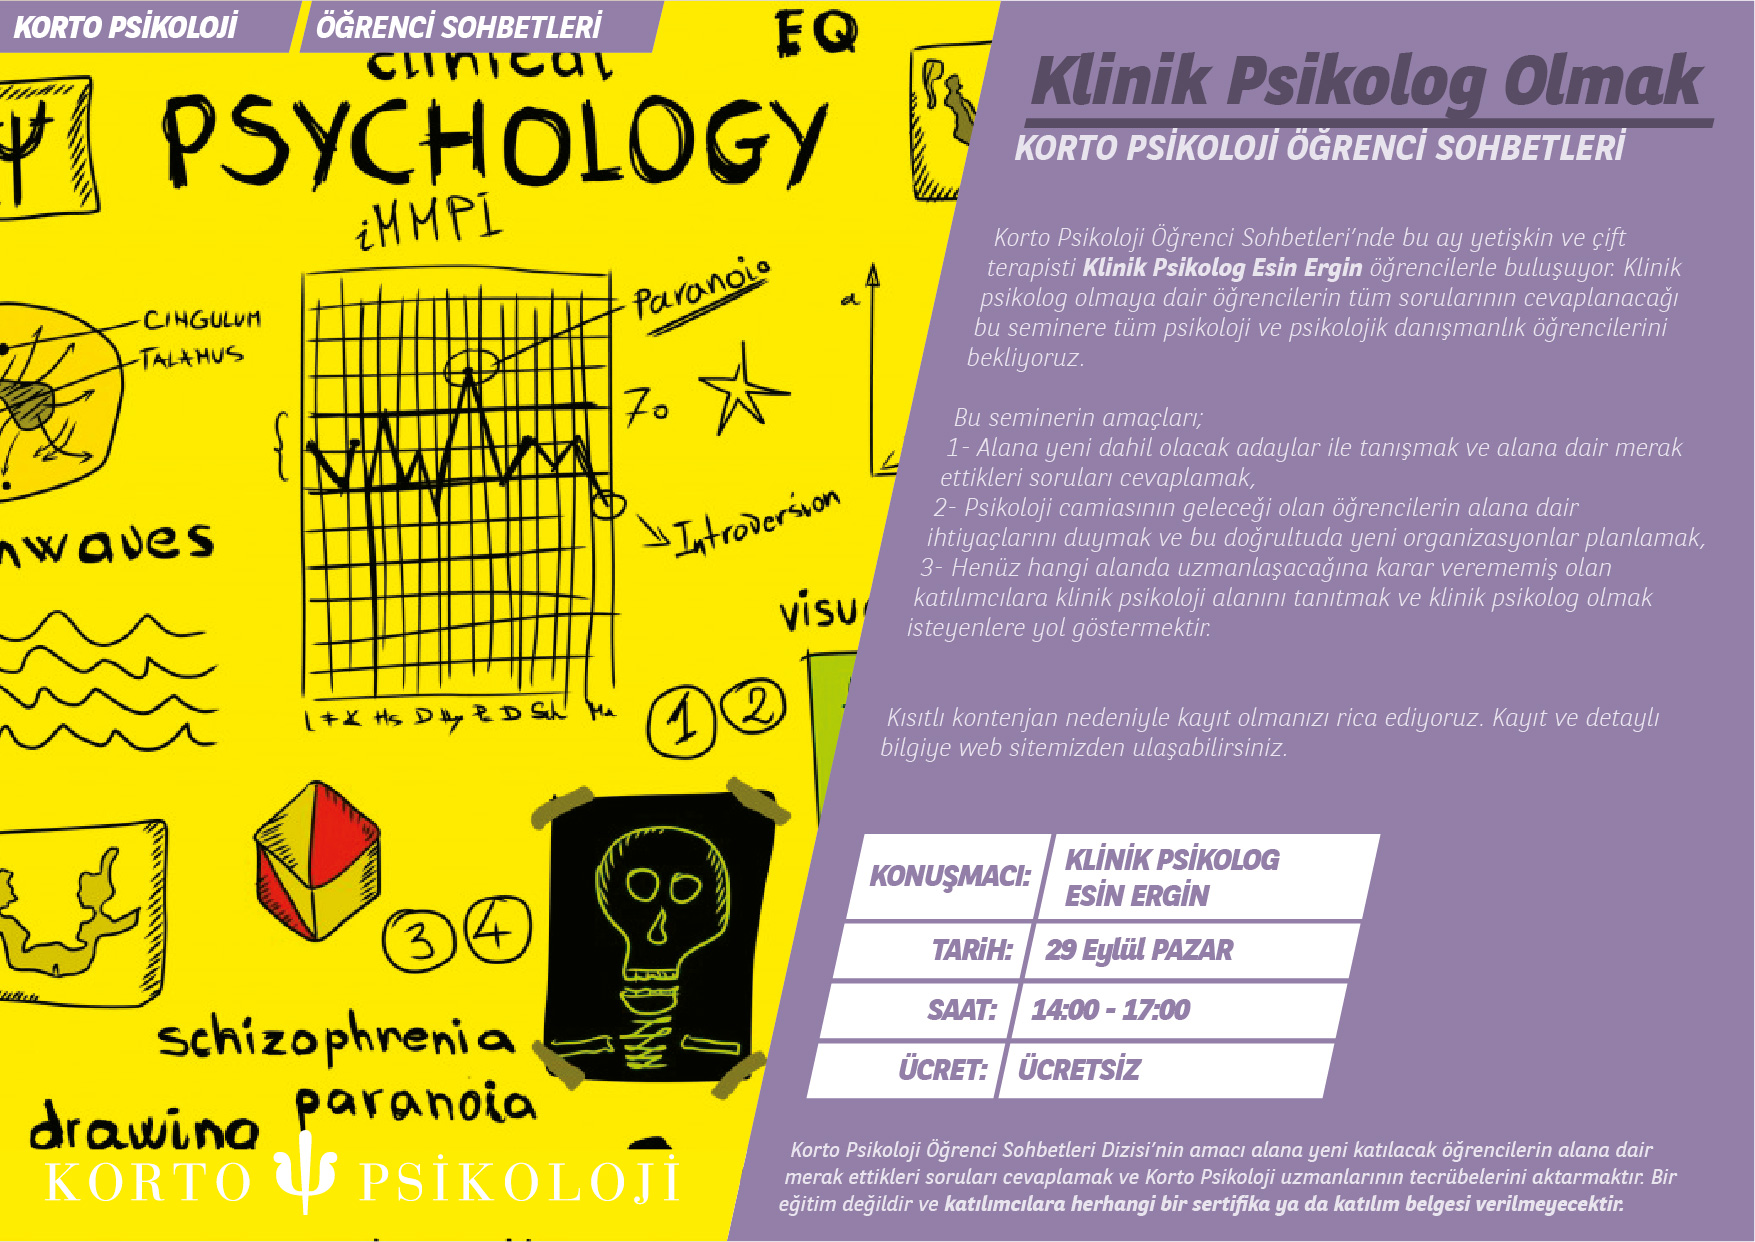 klinik psikolog olmak